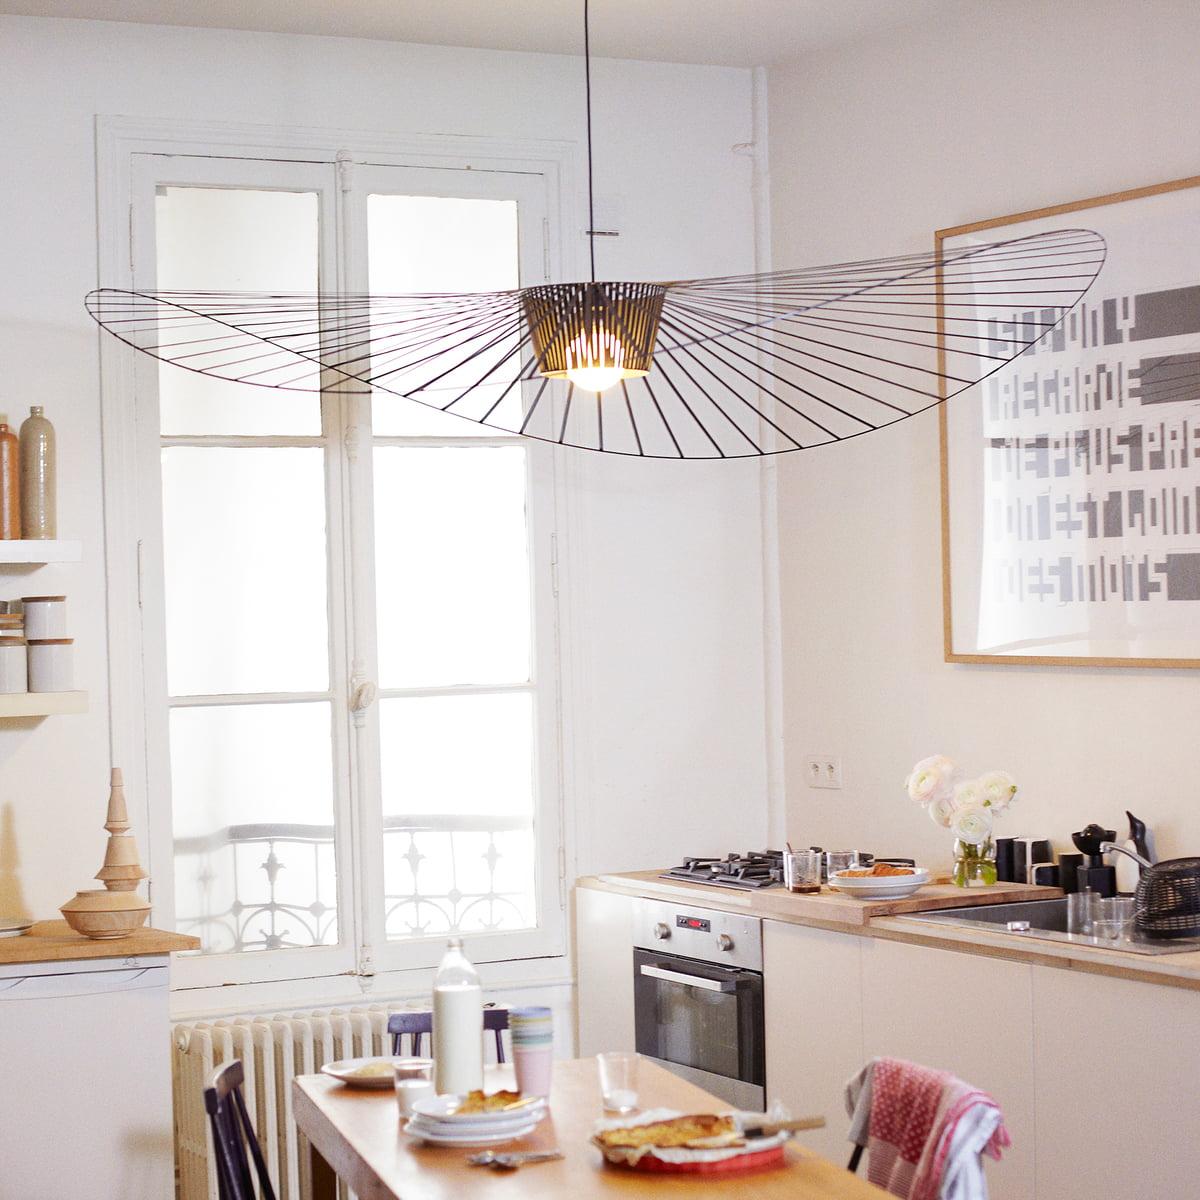 suspension vertigo petite friture. Black Bedroom Furniture Sets. Home Design Ideas